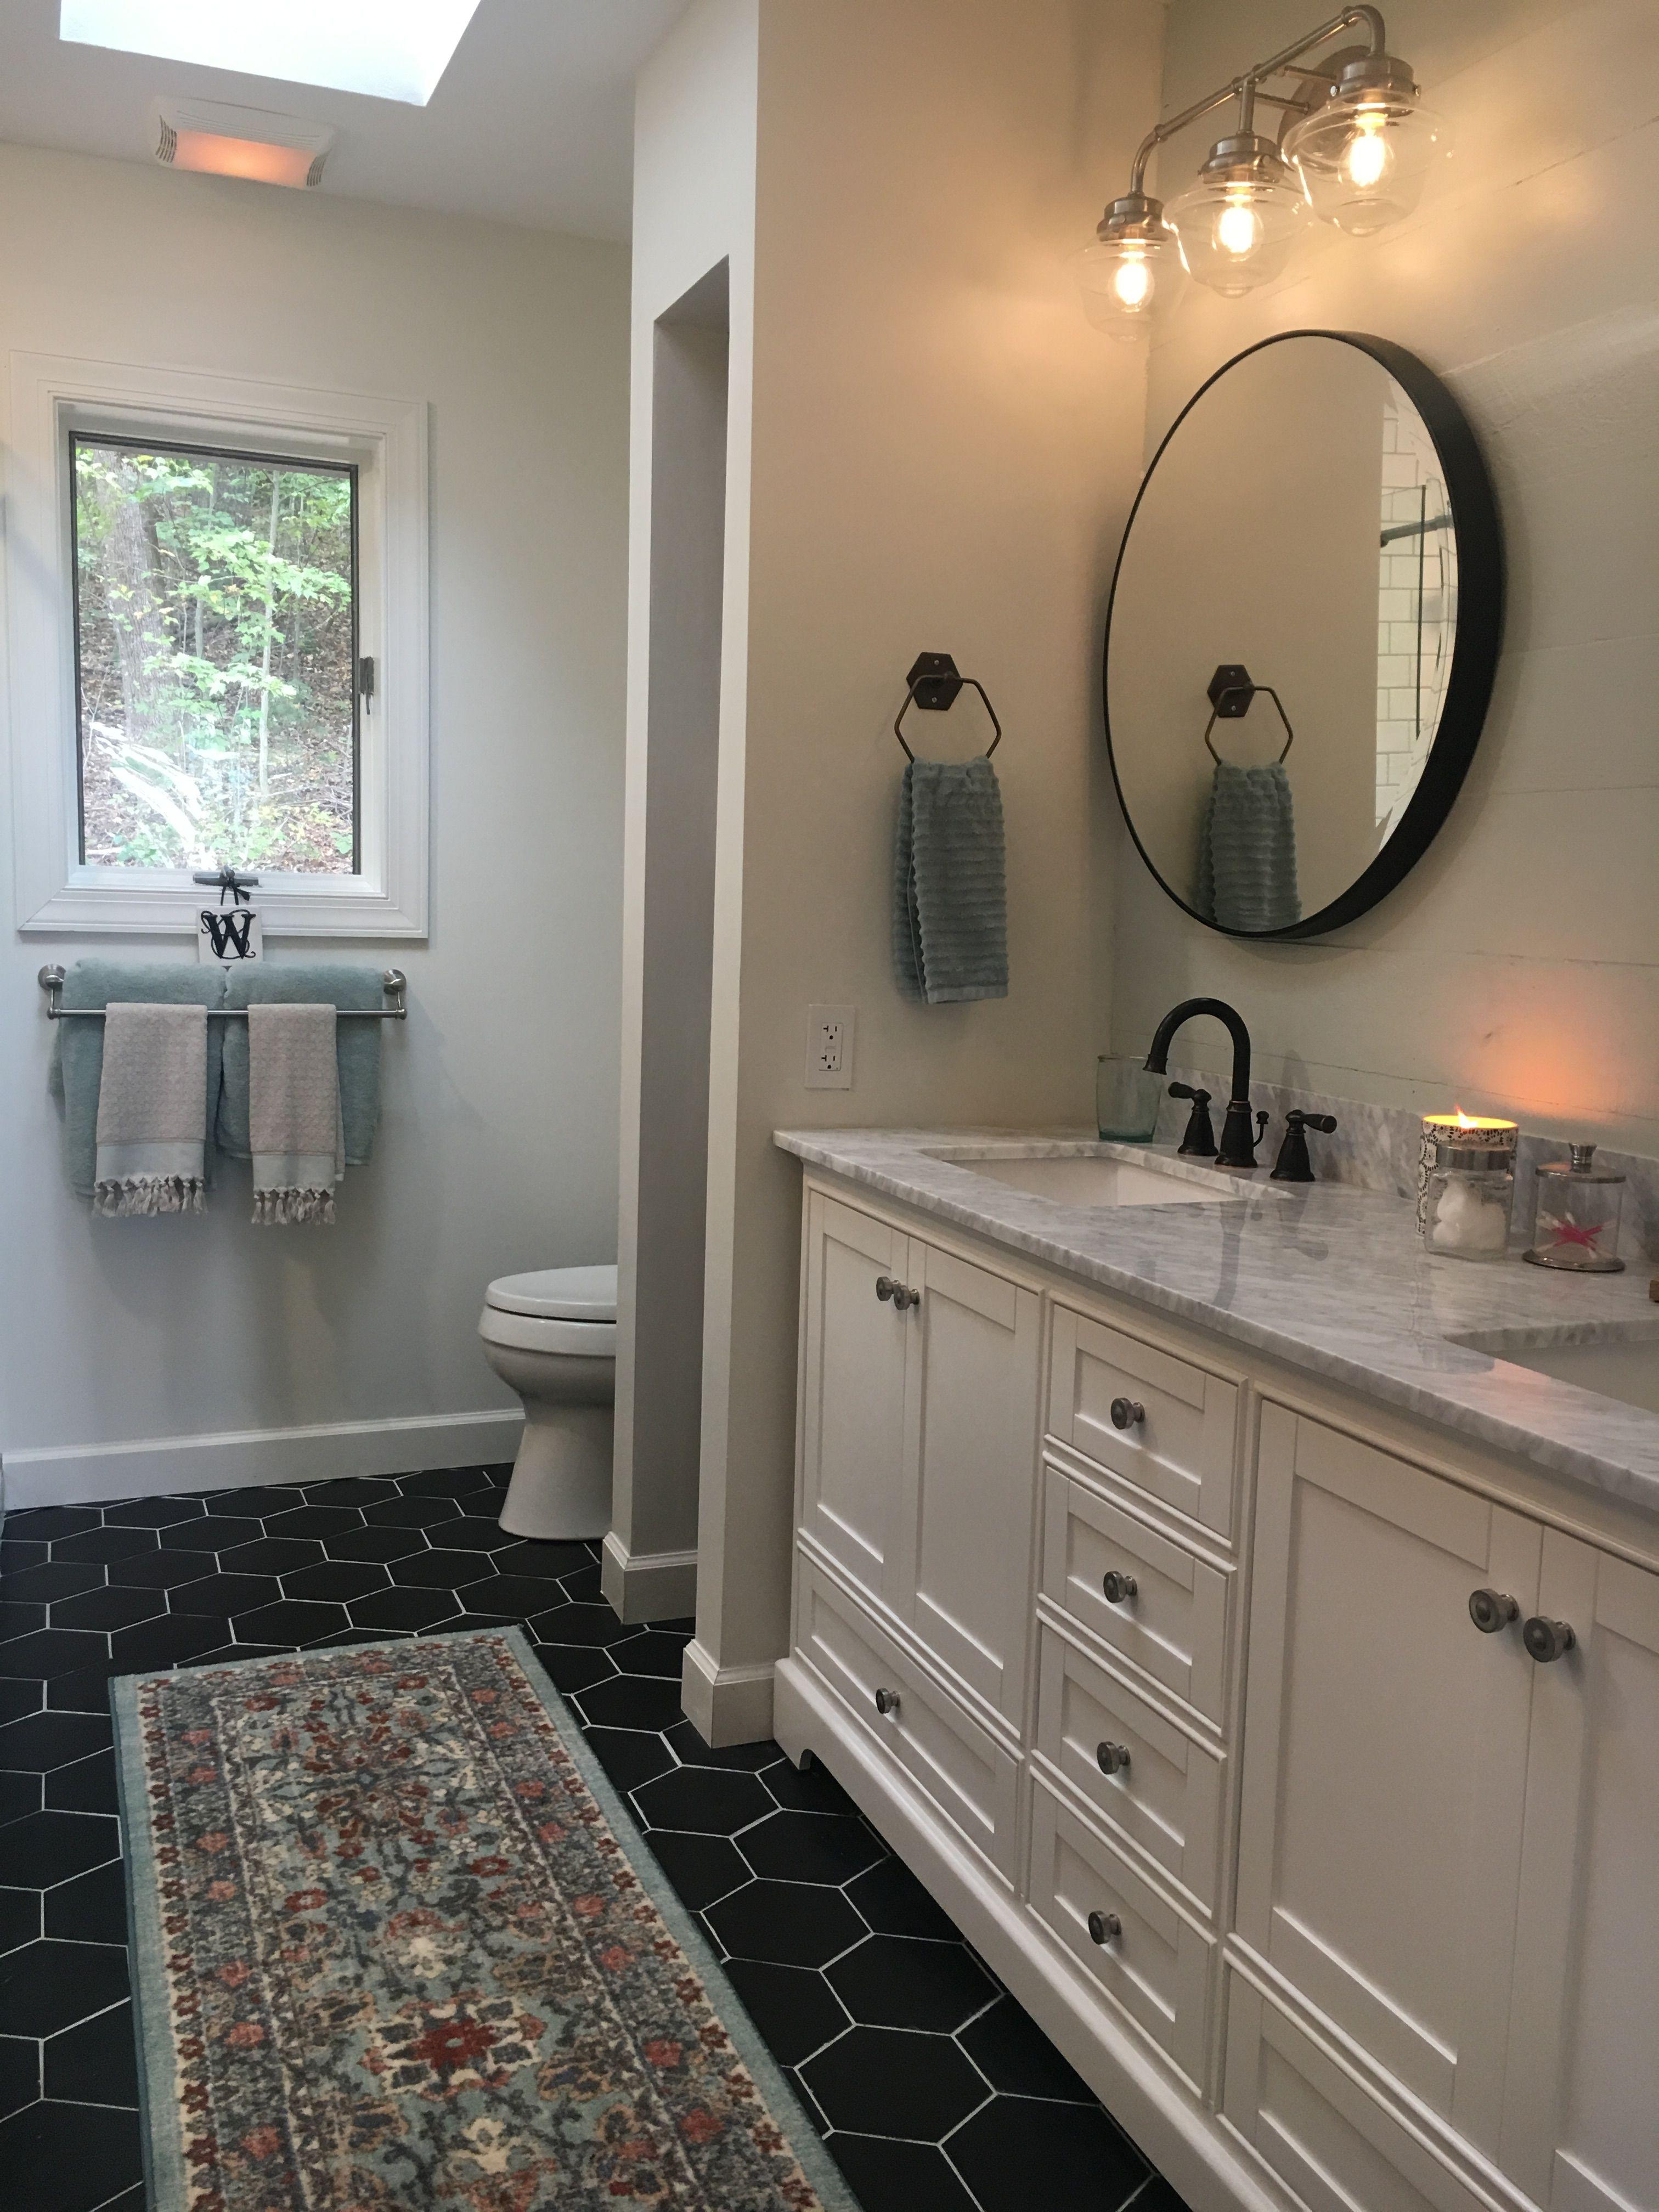 Wayfair Round Mirrors In Oil Rubbed Bronze Black Hex Tile White Double Bathroom Fixtures Brushed Nickel Black And White Tiles Bathroom White Vanity Bathroom